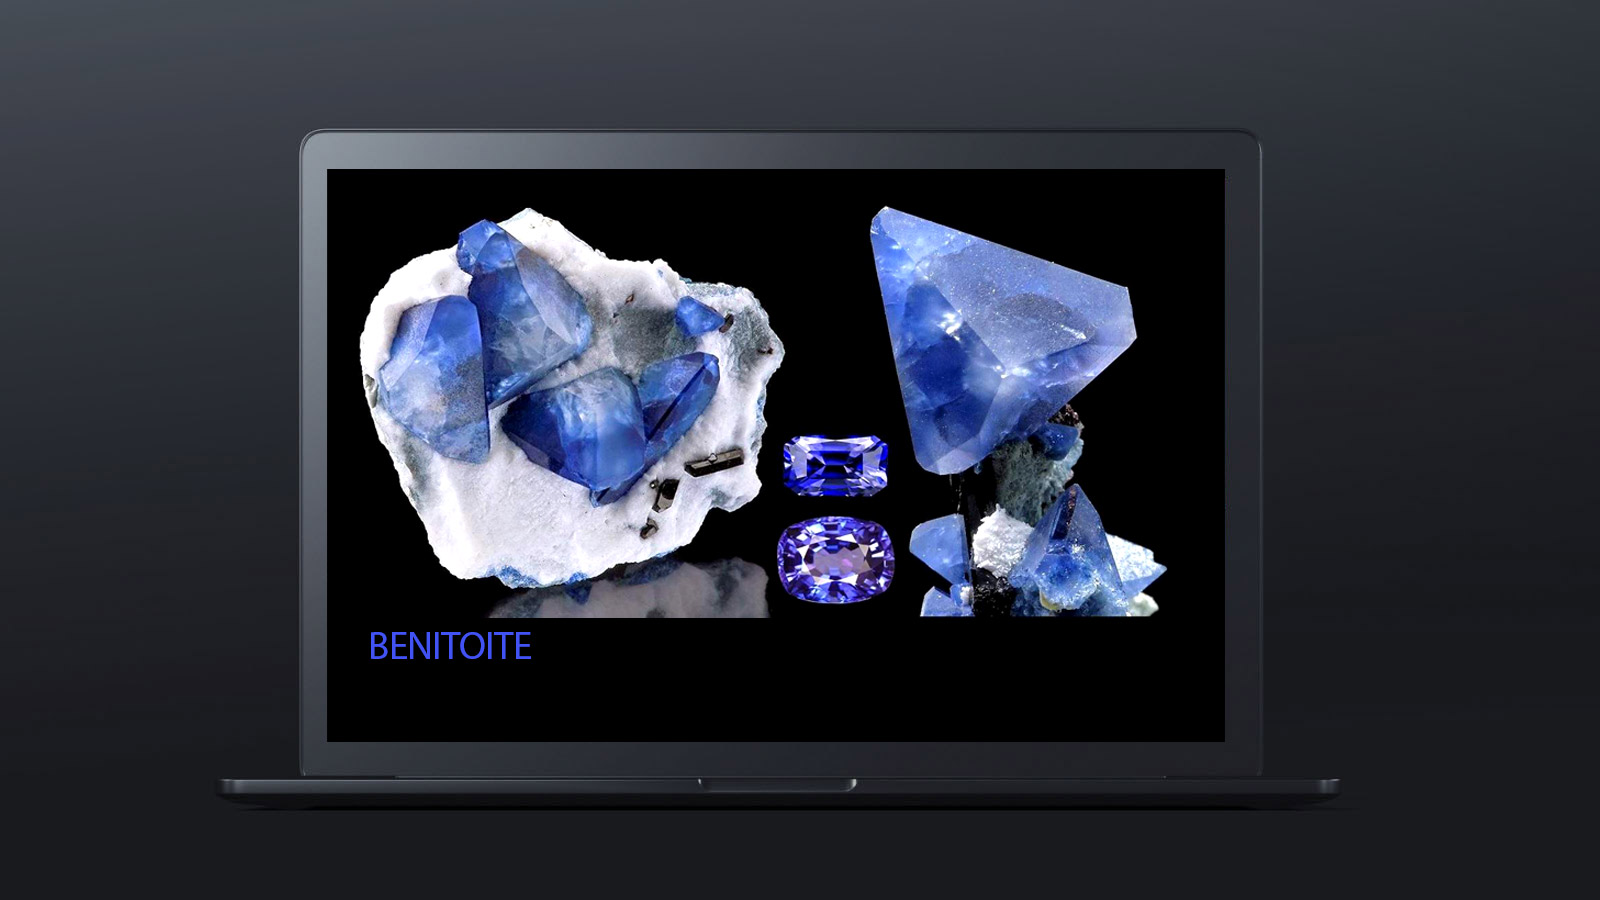 10 worlds rarest gemstones BENITOITE 1 - ده گوهر کمیاب دنیا کدامند؟